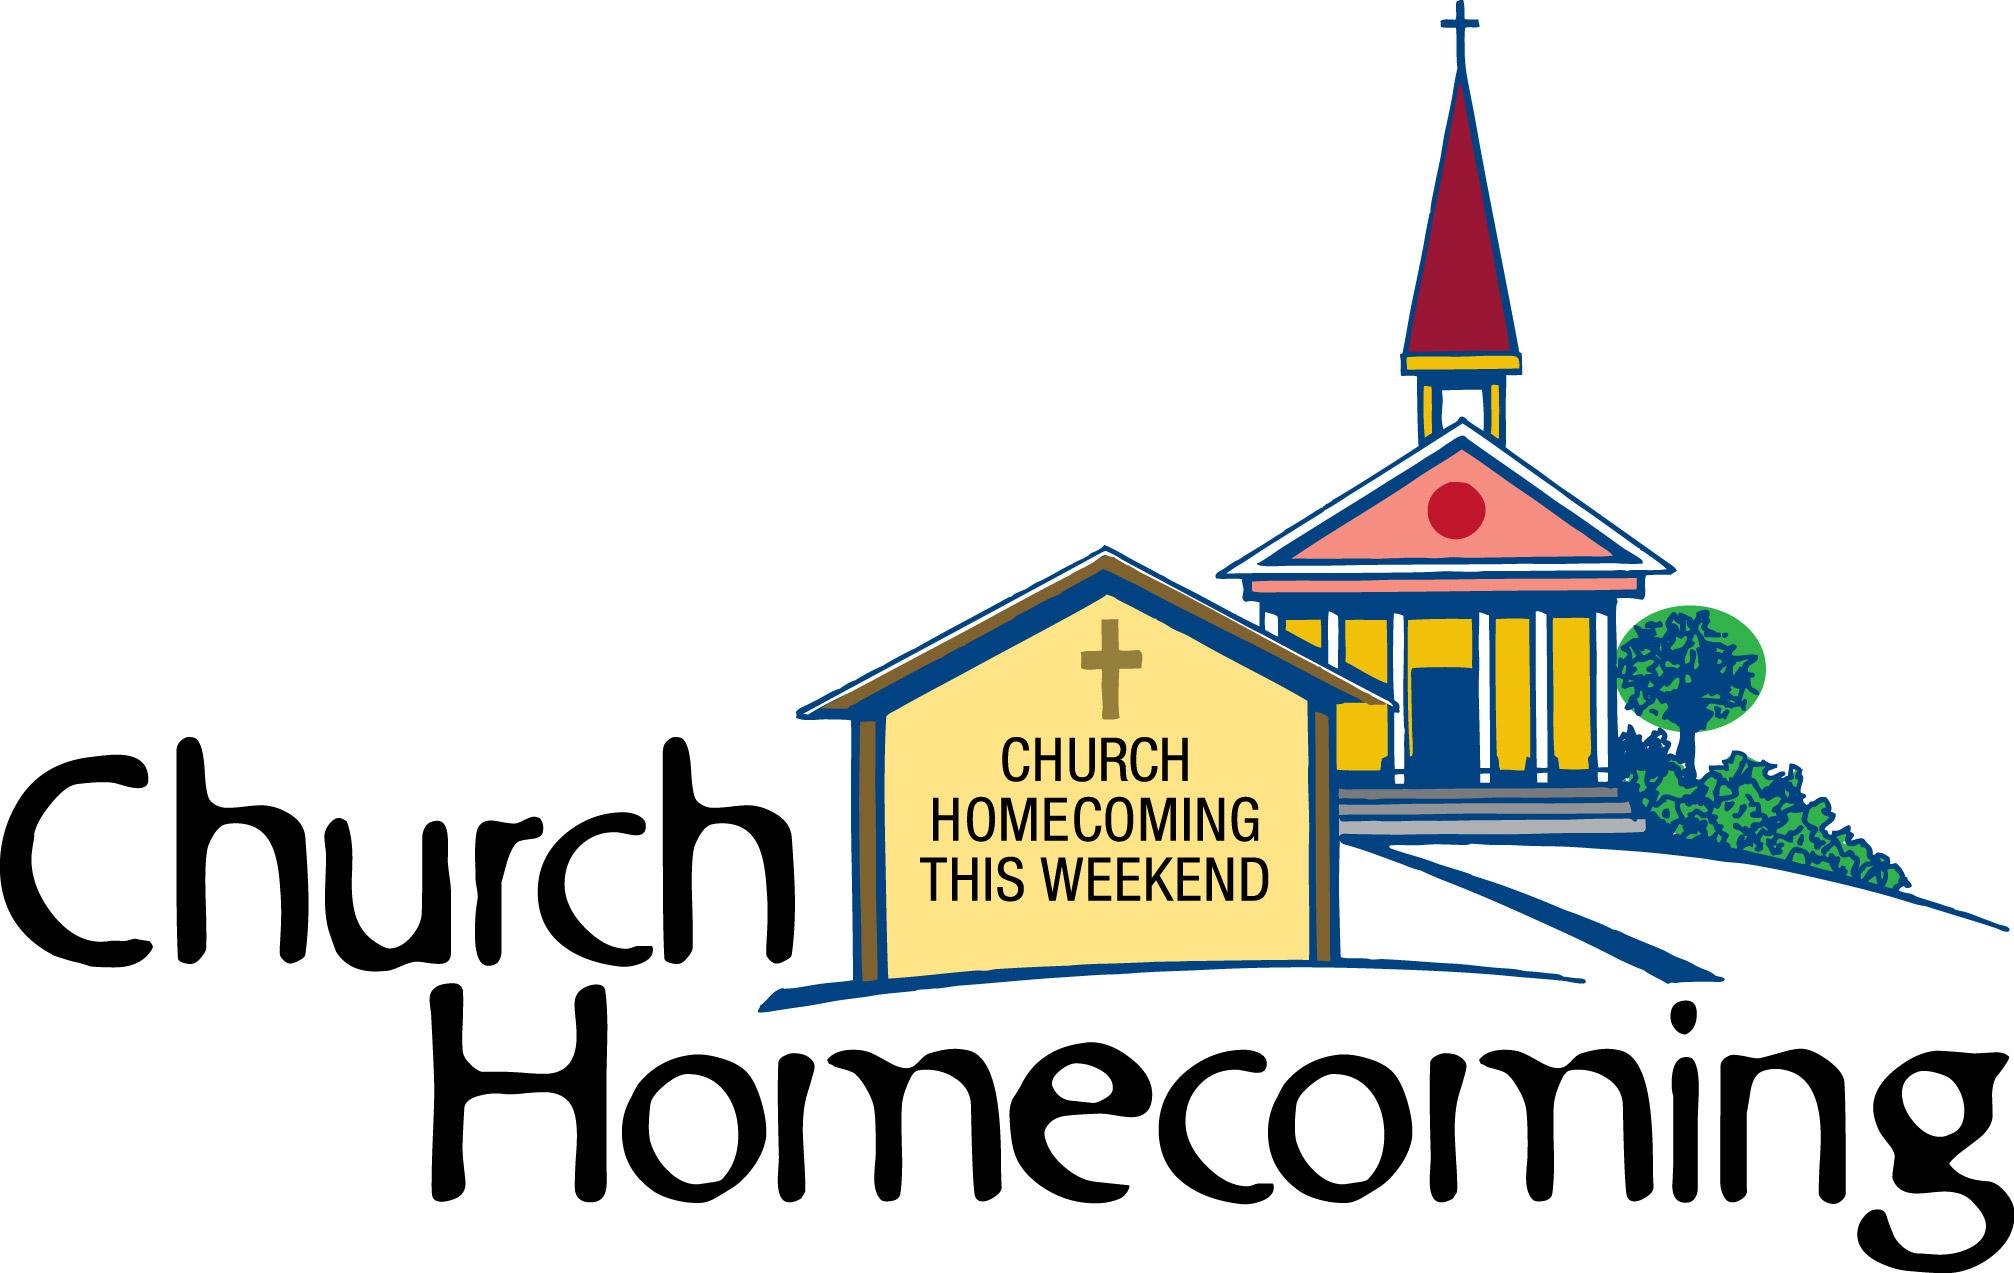 Church clipart baptist church. Goodwill of washington homecoming